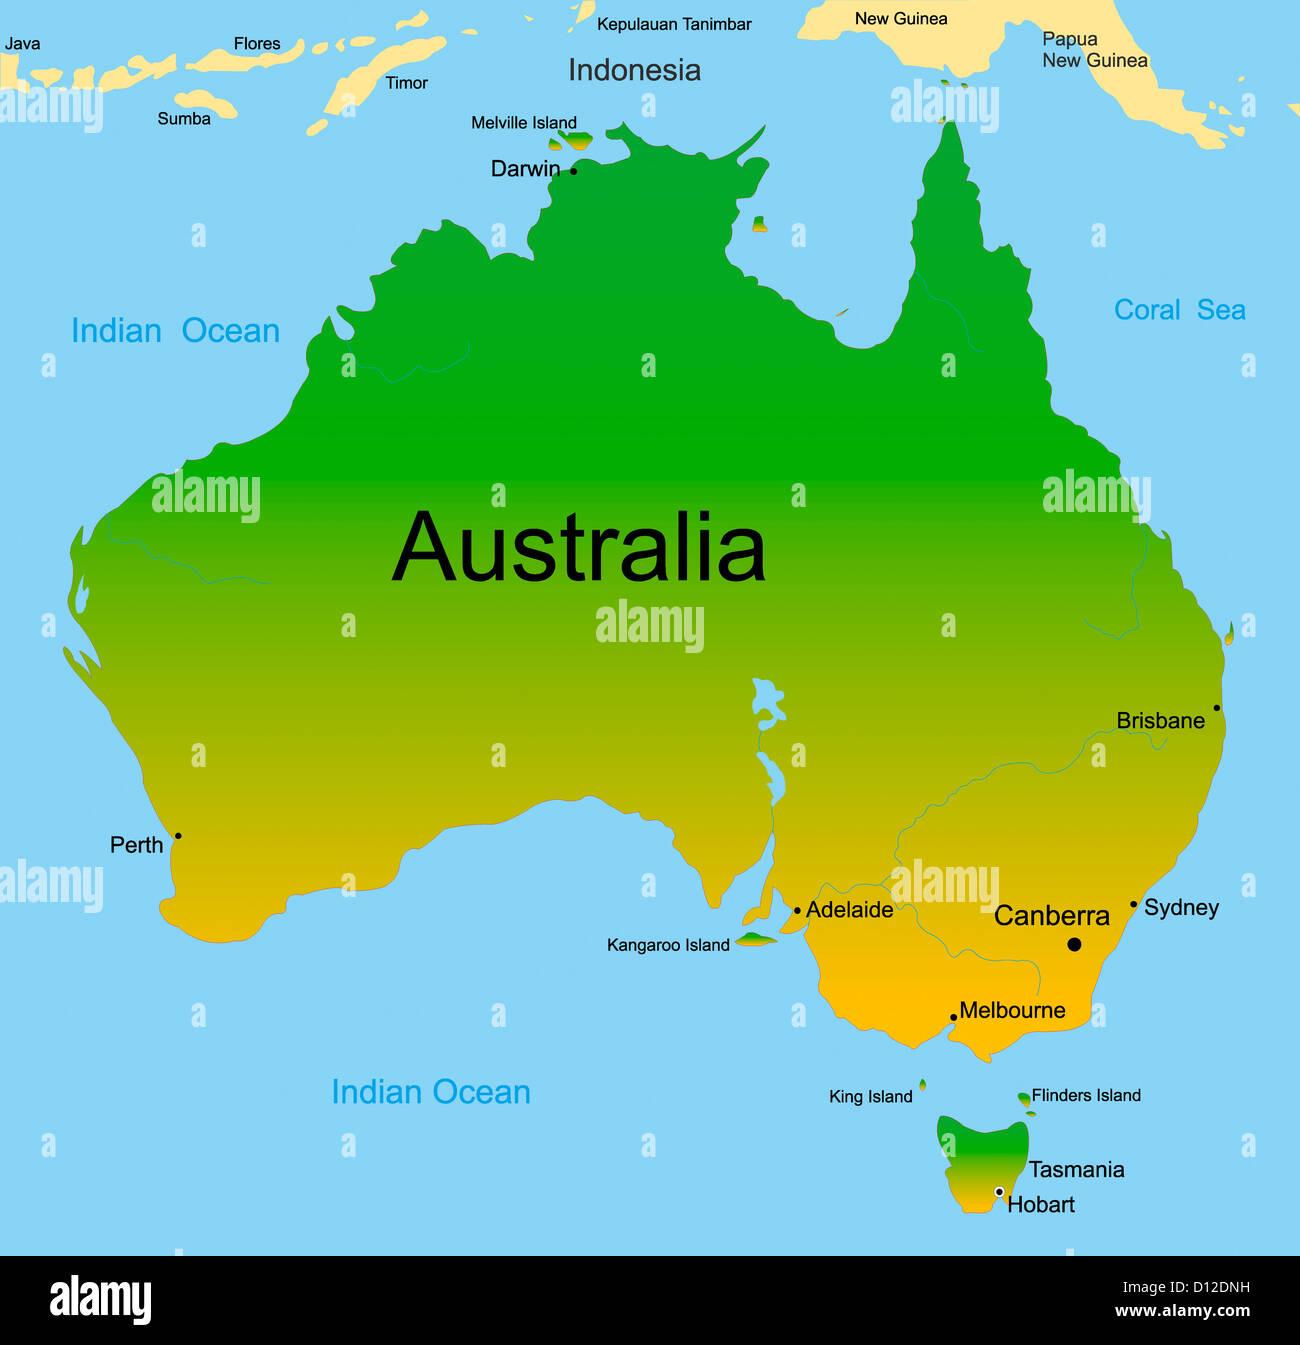 map of australian continent Stock Photo: 52300461 - Alamy